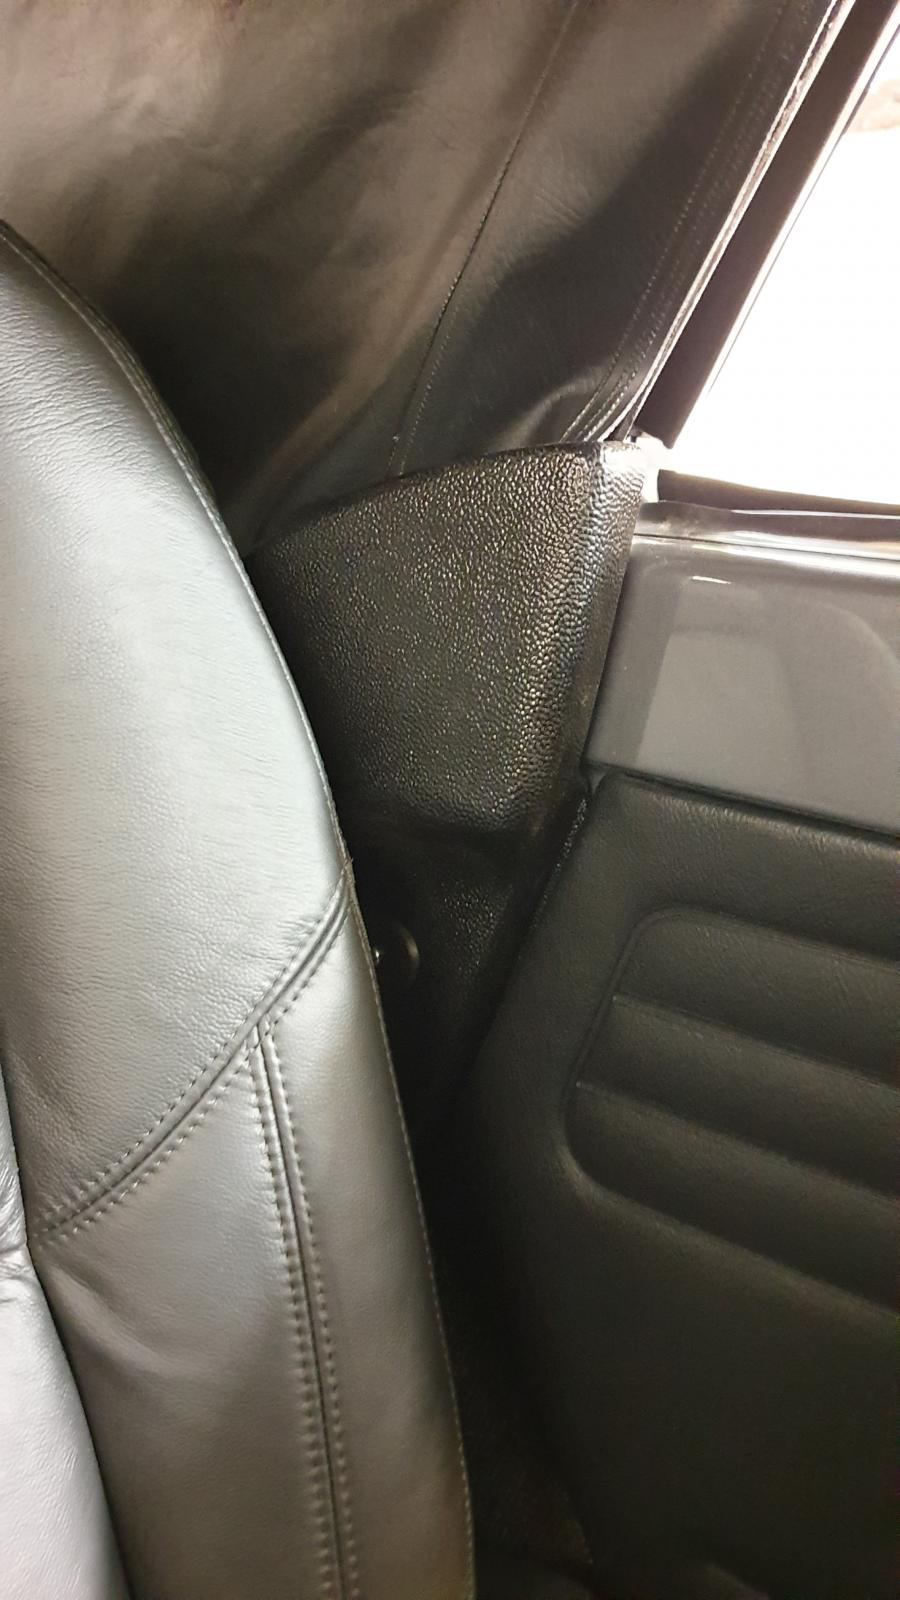 Hinge covers convertible